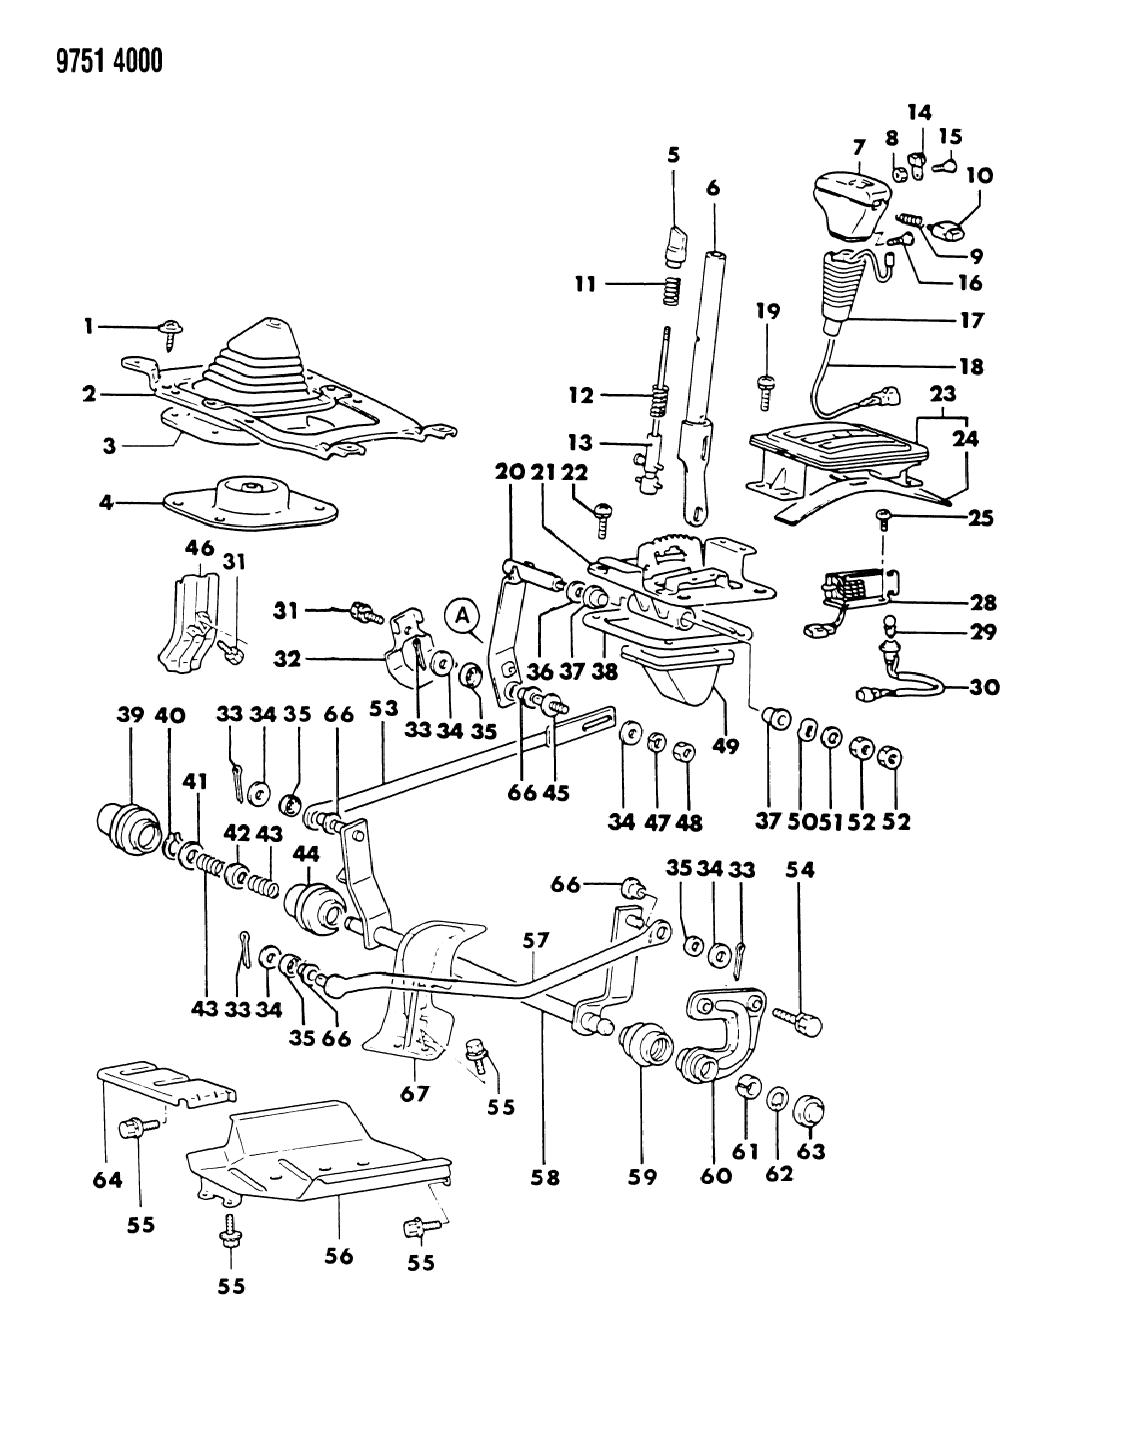 1989 dodge raider controls gearshift mopar parts giant rh moparpartsgiant com 1990 Dodge Dakota Wiring Diagram Dodge Pickup Wiring Diagram